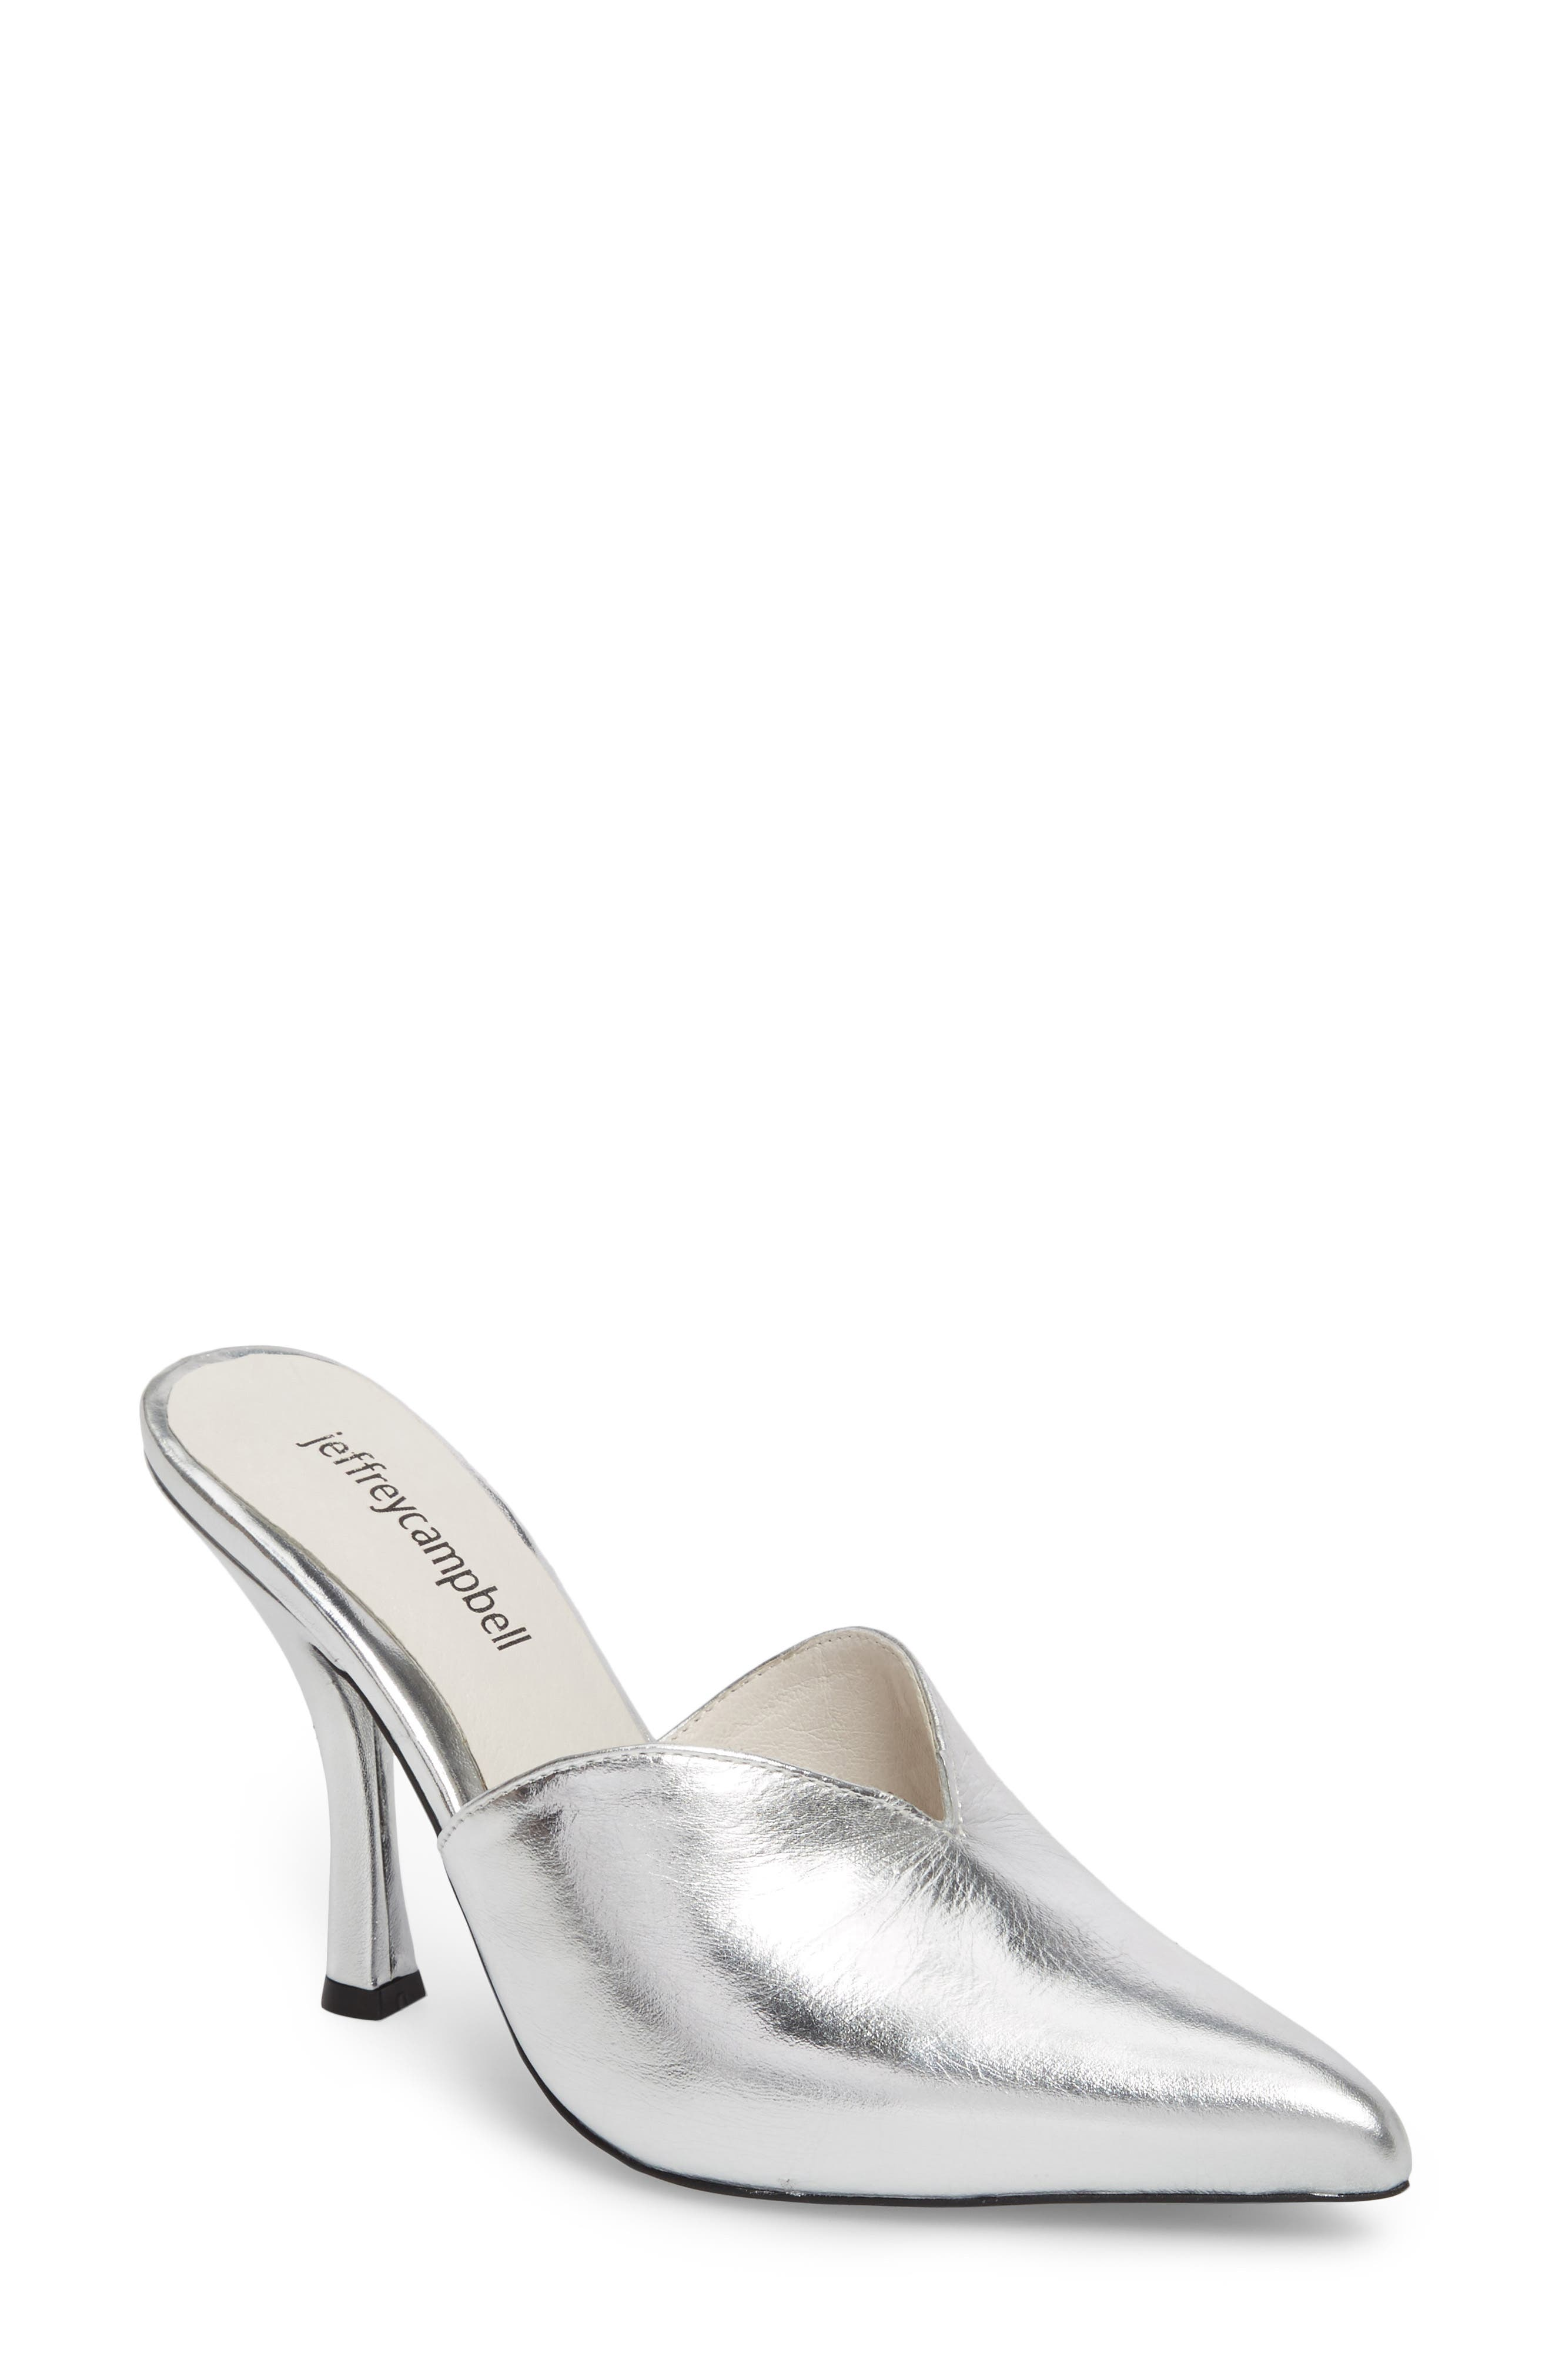 Jodeci Sweetheart Mule Pump,                             Main thumbnail 1, color,                             Silver Leather